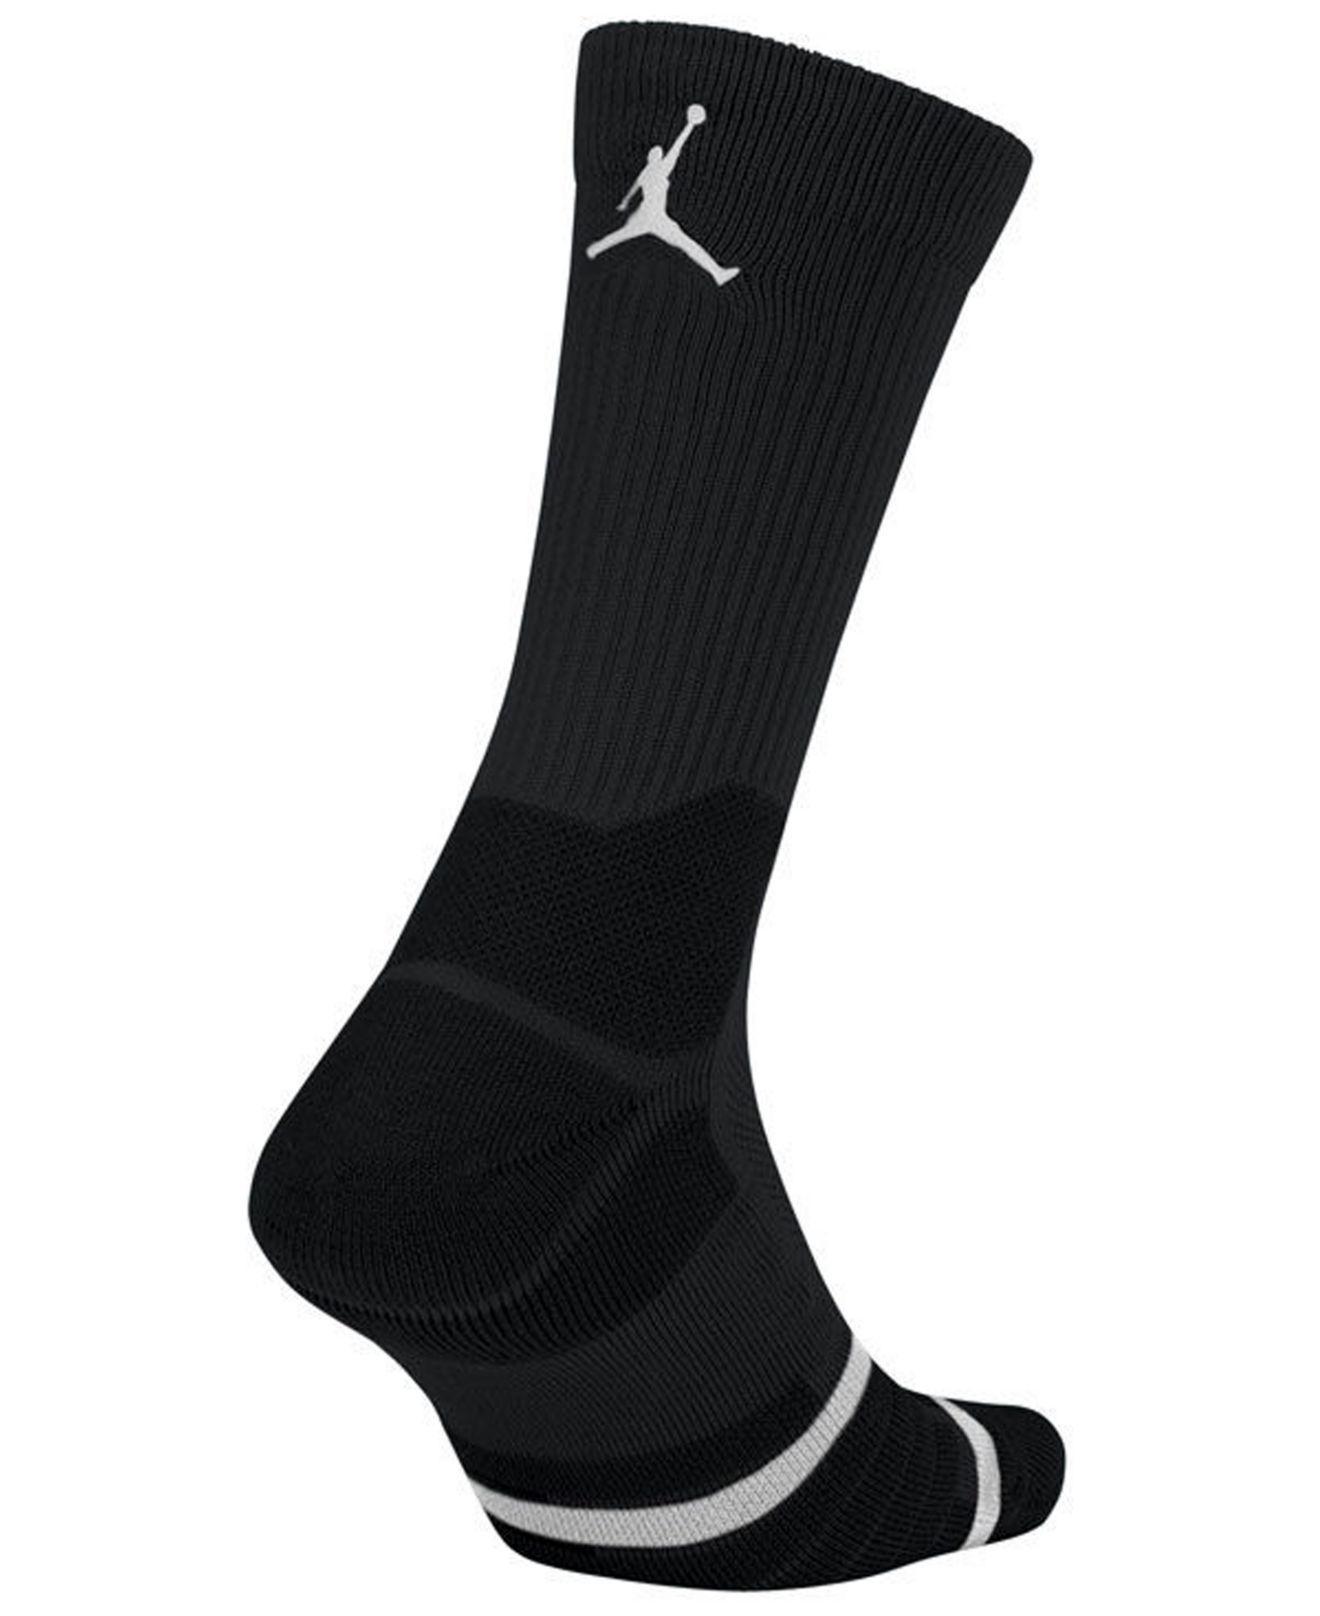 competitive price c507a a606f Nike Nba All Star Elite Quick Jordan Crew Socks in Black for Men - Lyst